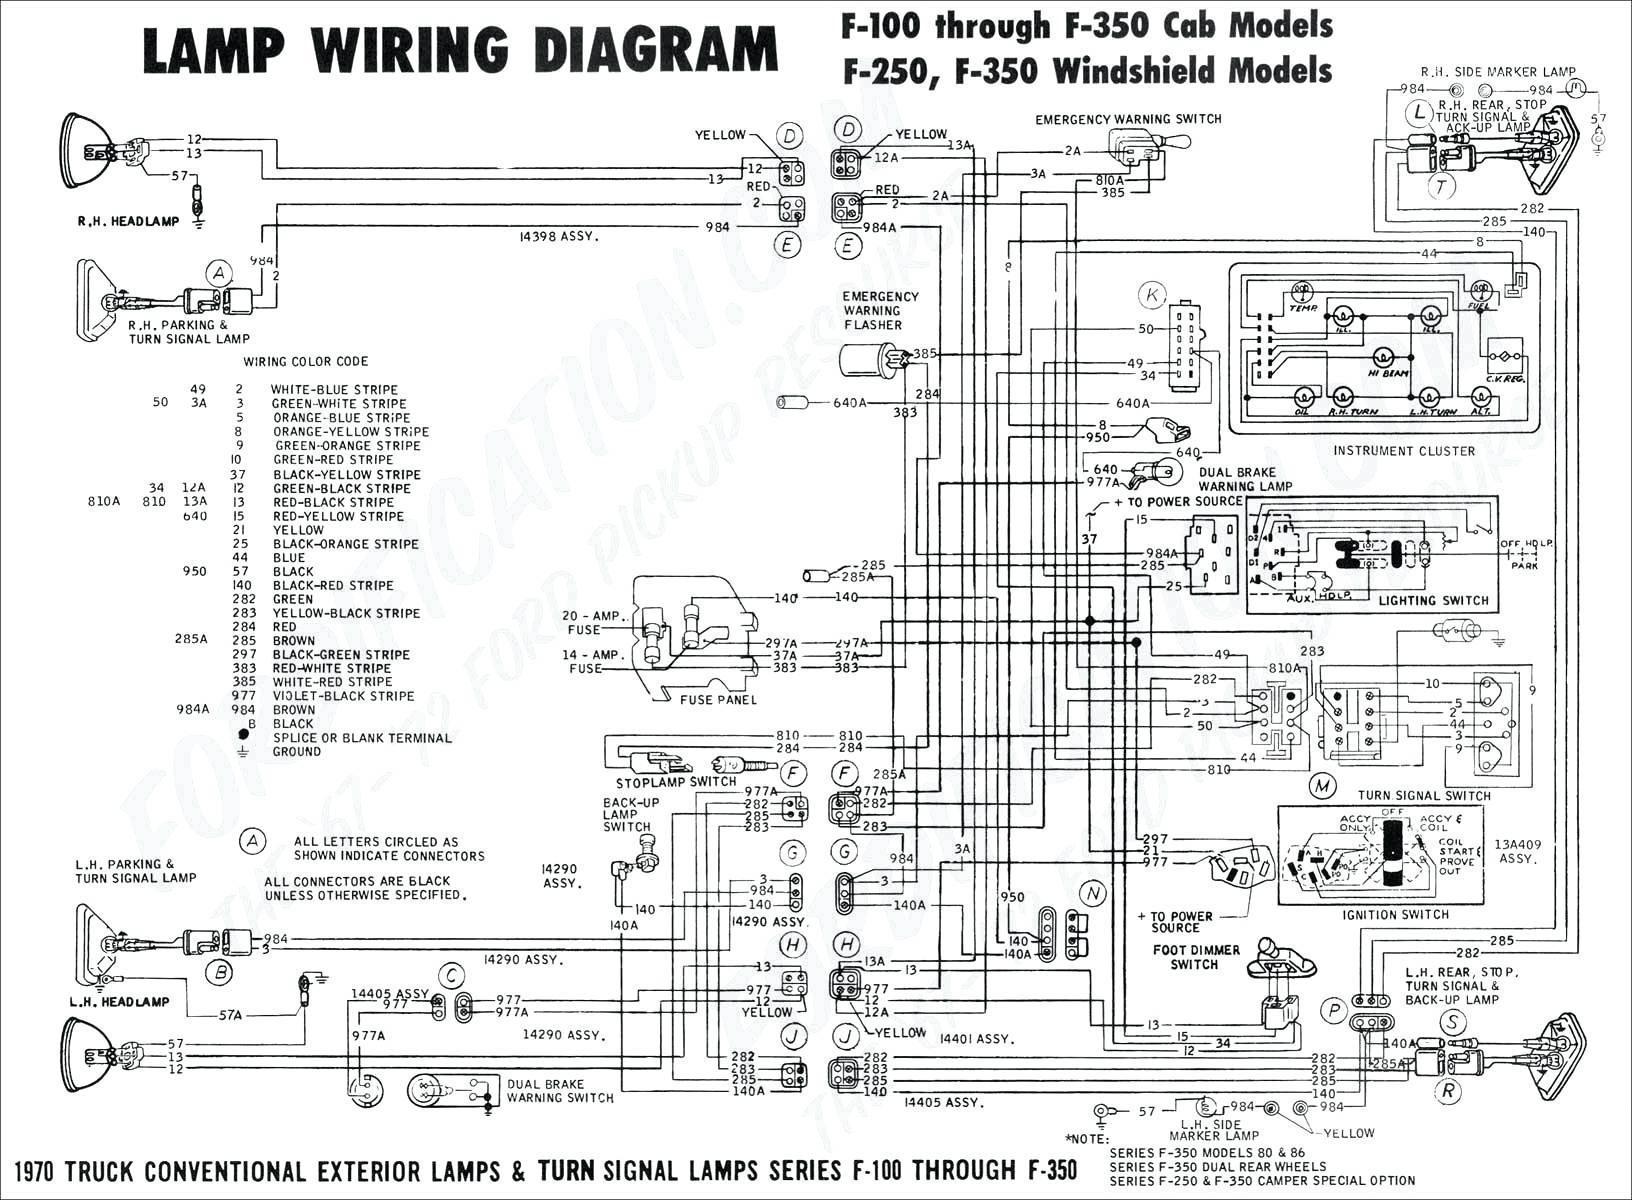 Led Tail Light Wiring Diagram Tail Light Wiring for Silverado 1500 2004 Real Wiring Diagram • Of Led Tail Light Wiring Diagram